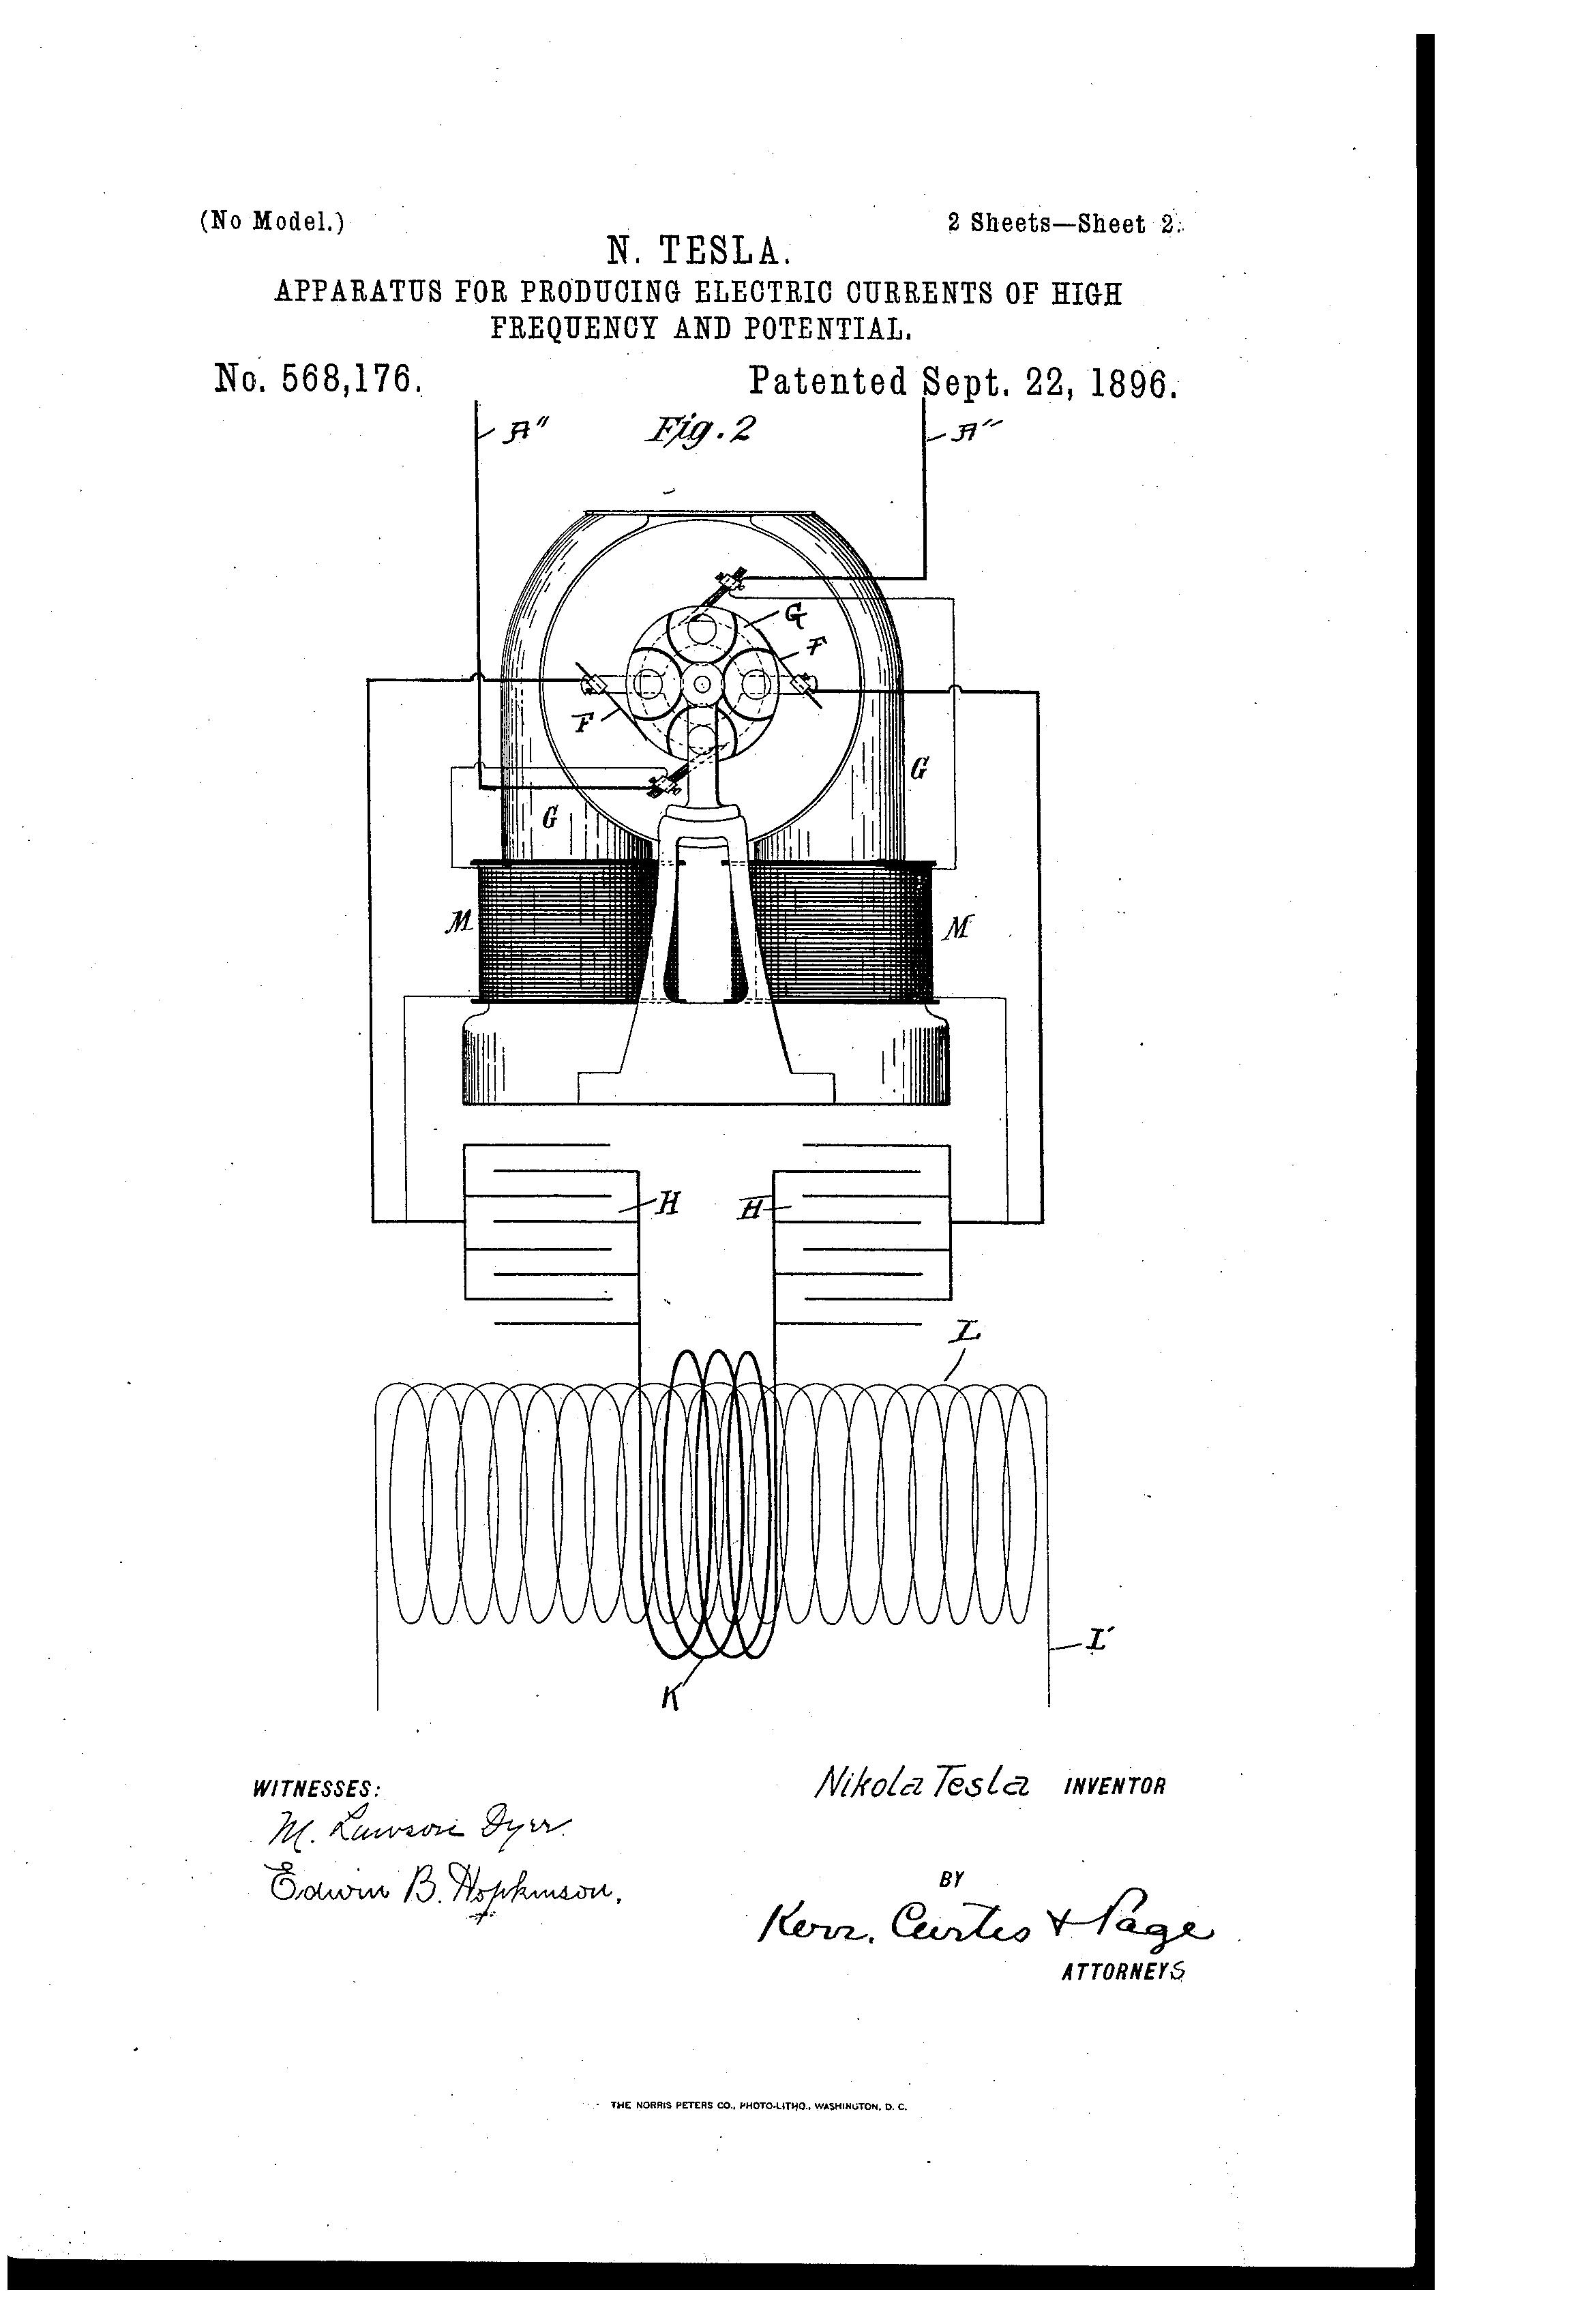 patent us568176 - nikola tesla